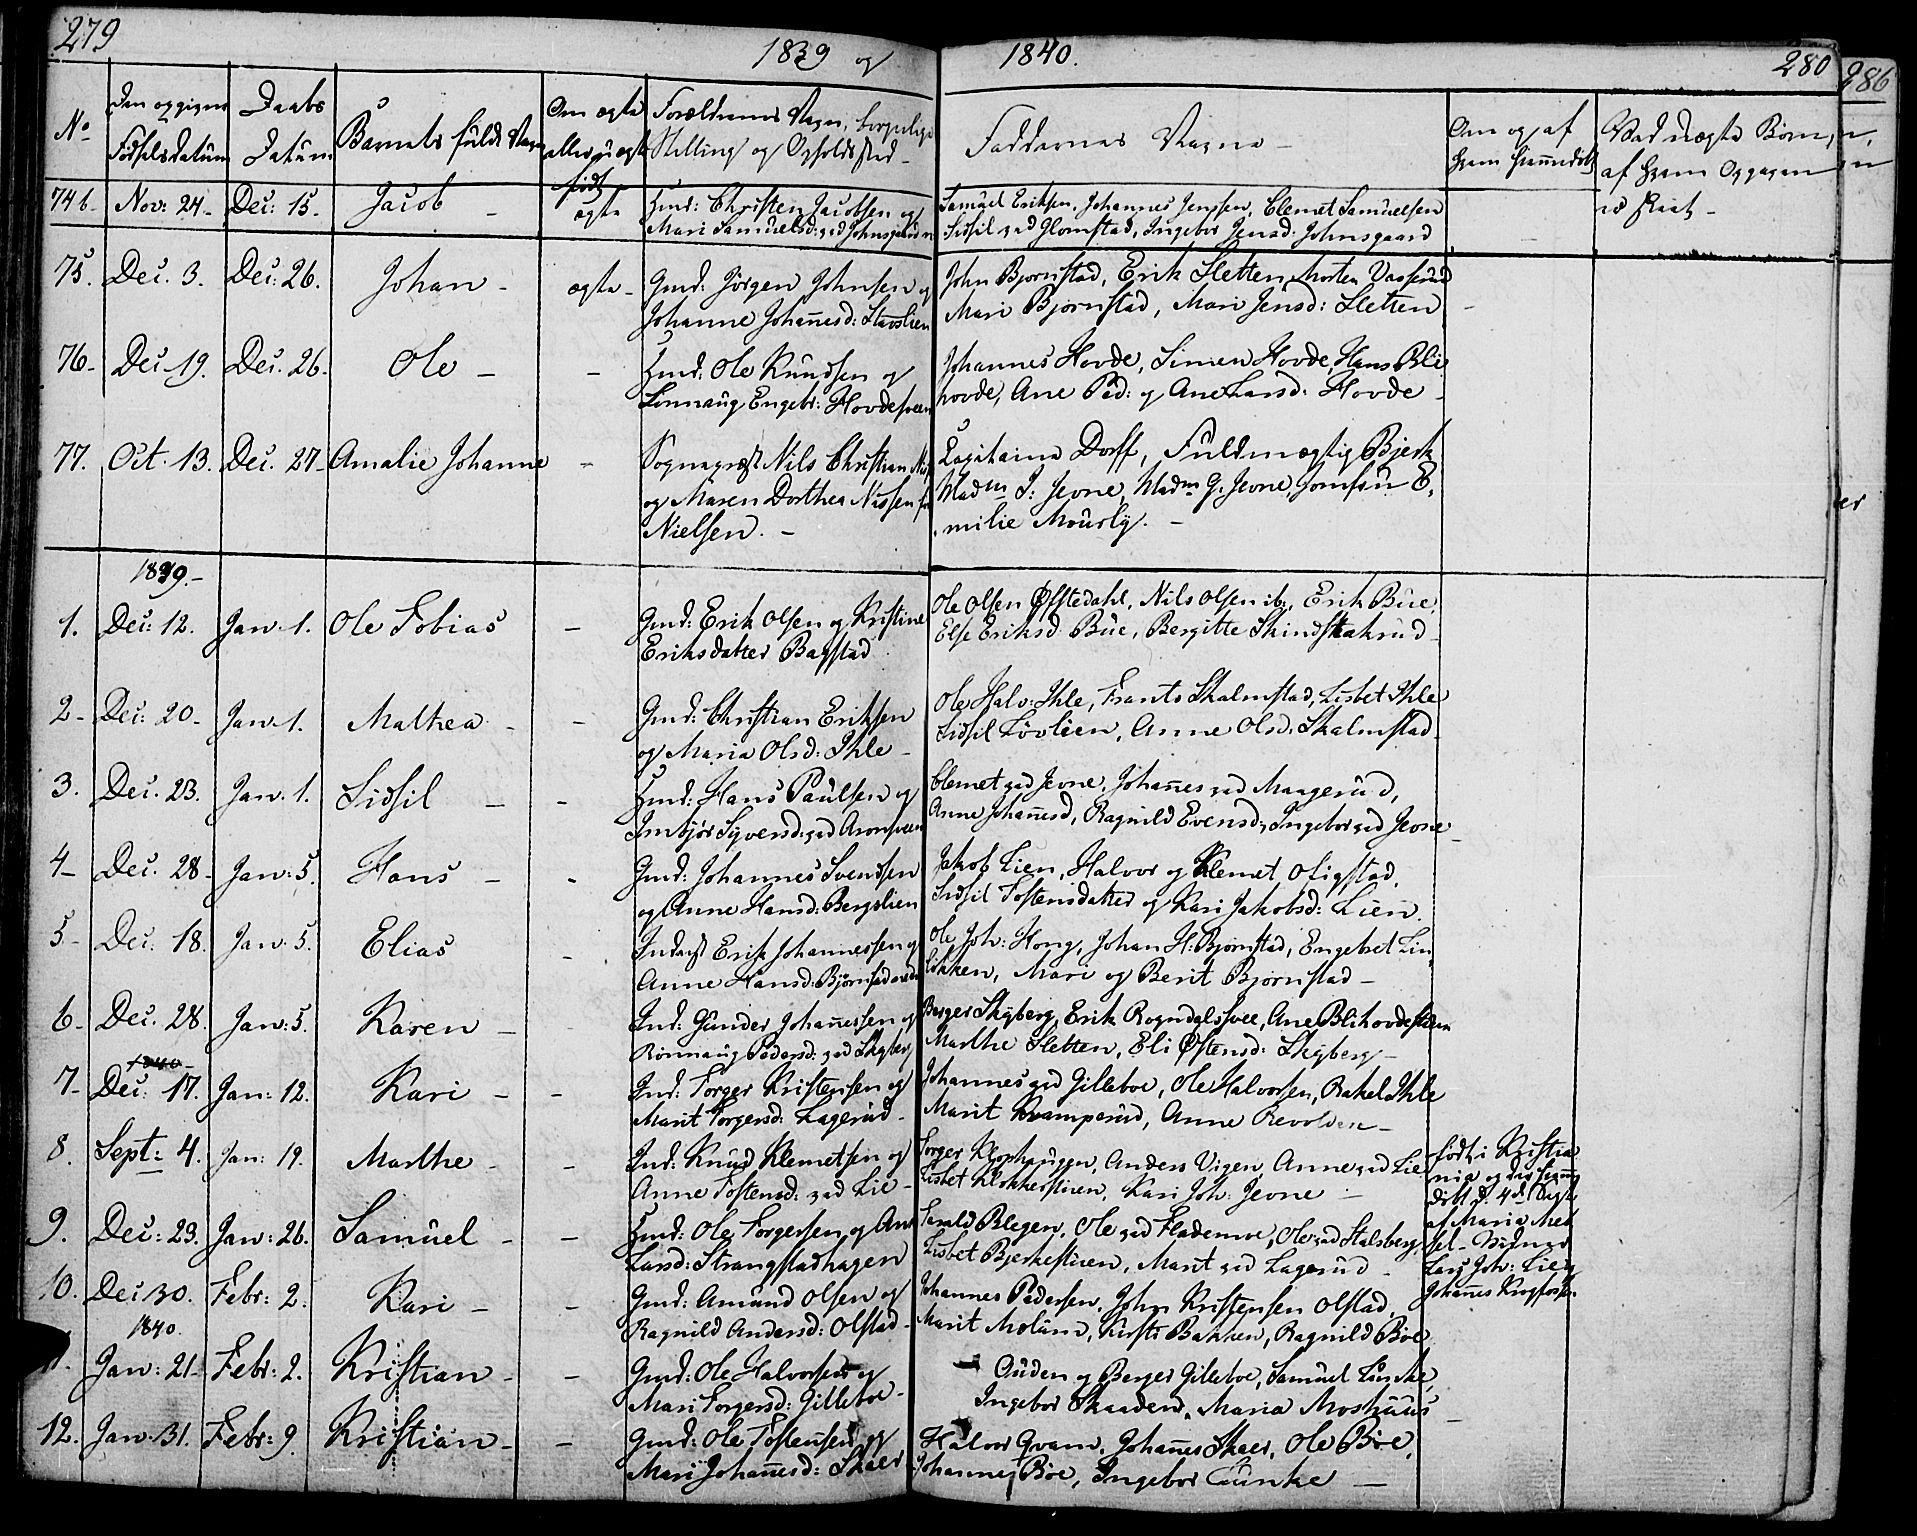 SAH, Øyer prestekontor, Ministerialbok nr. 4, 1824-1841, s. 279-280